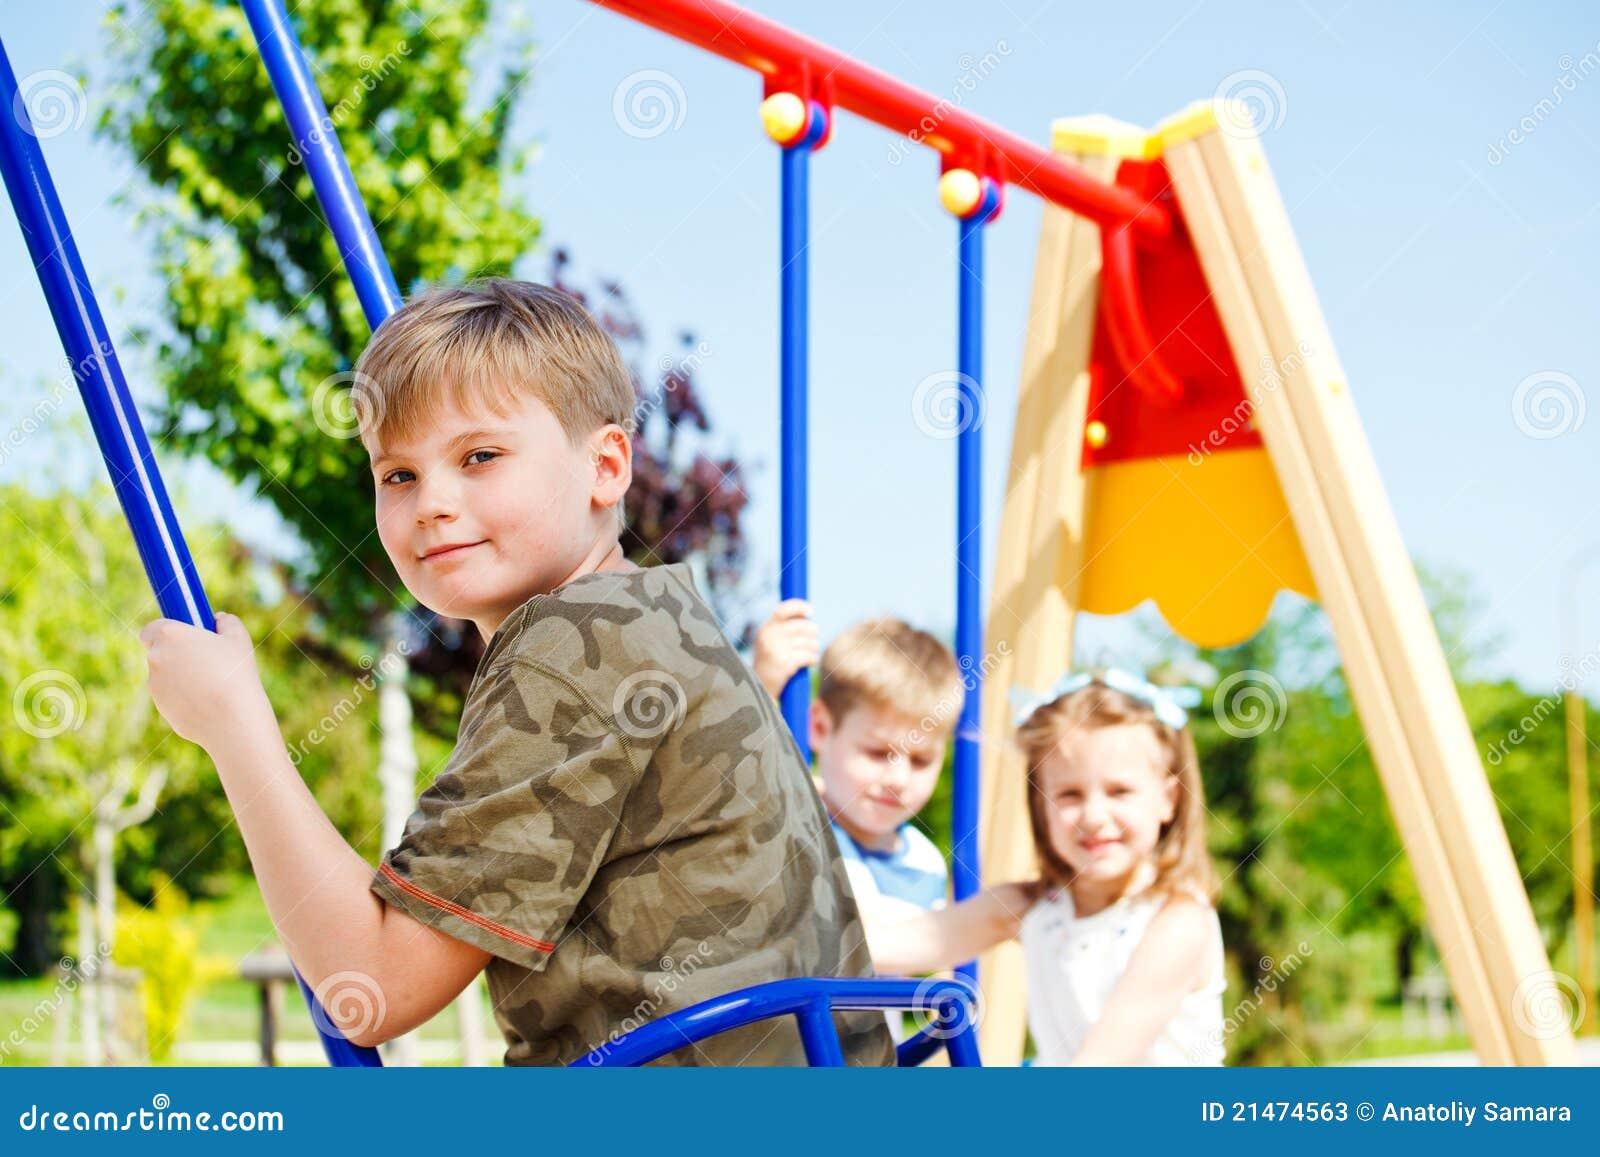 Kids Having Fun Stock Photos - Image: 21474563